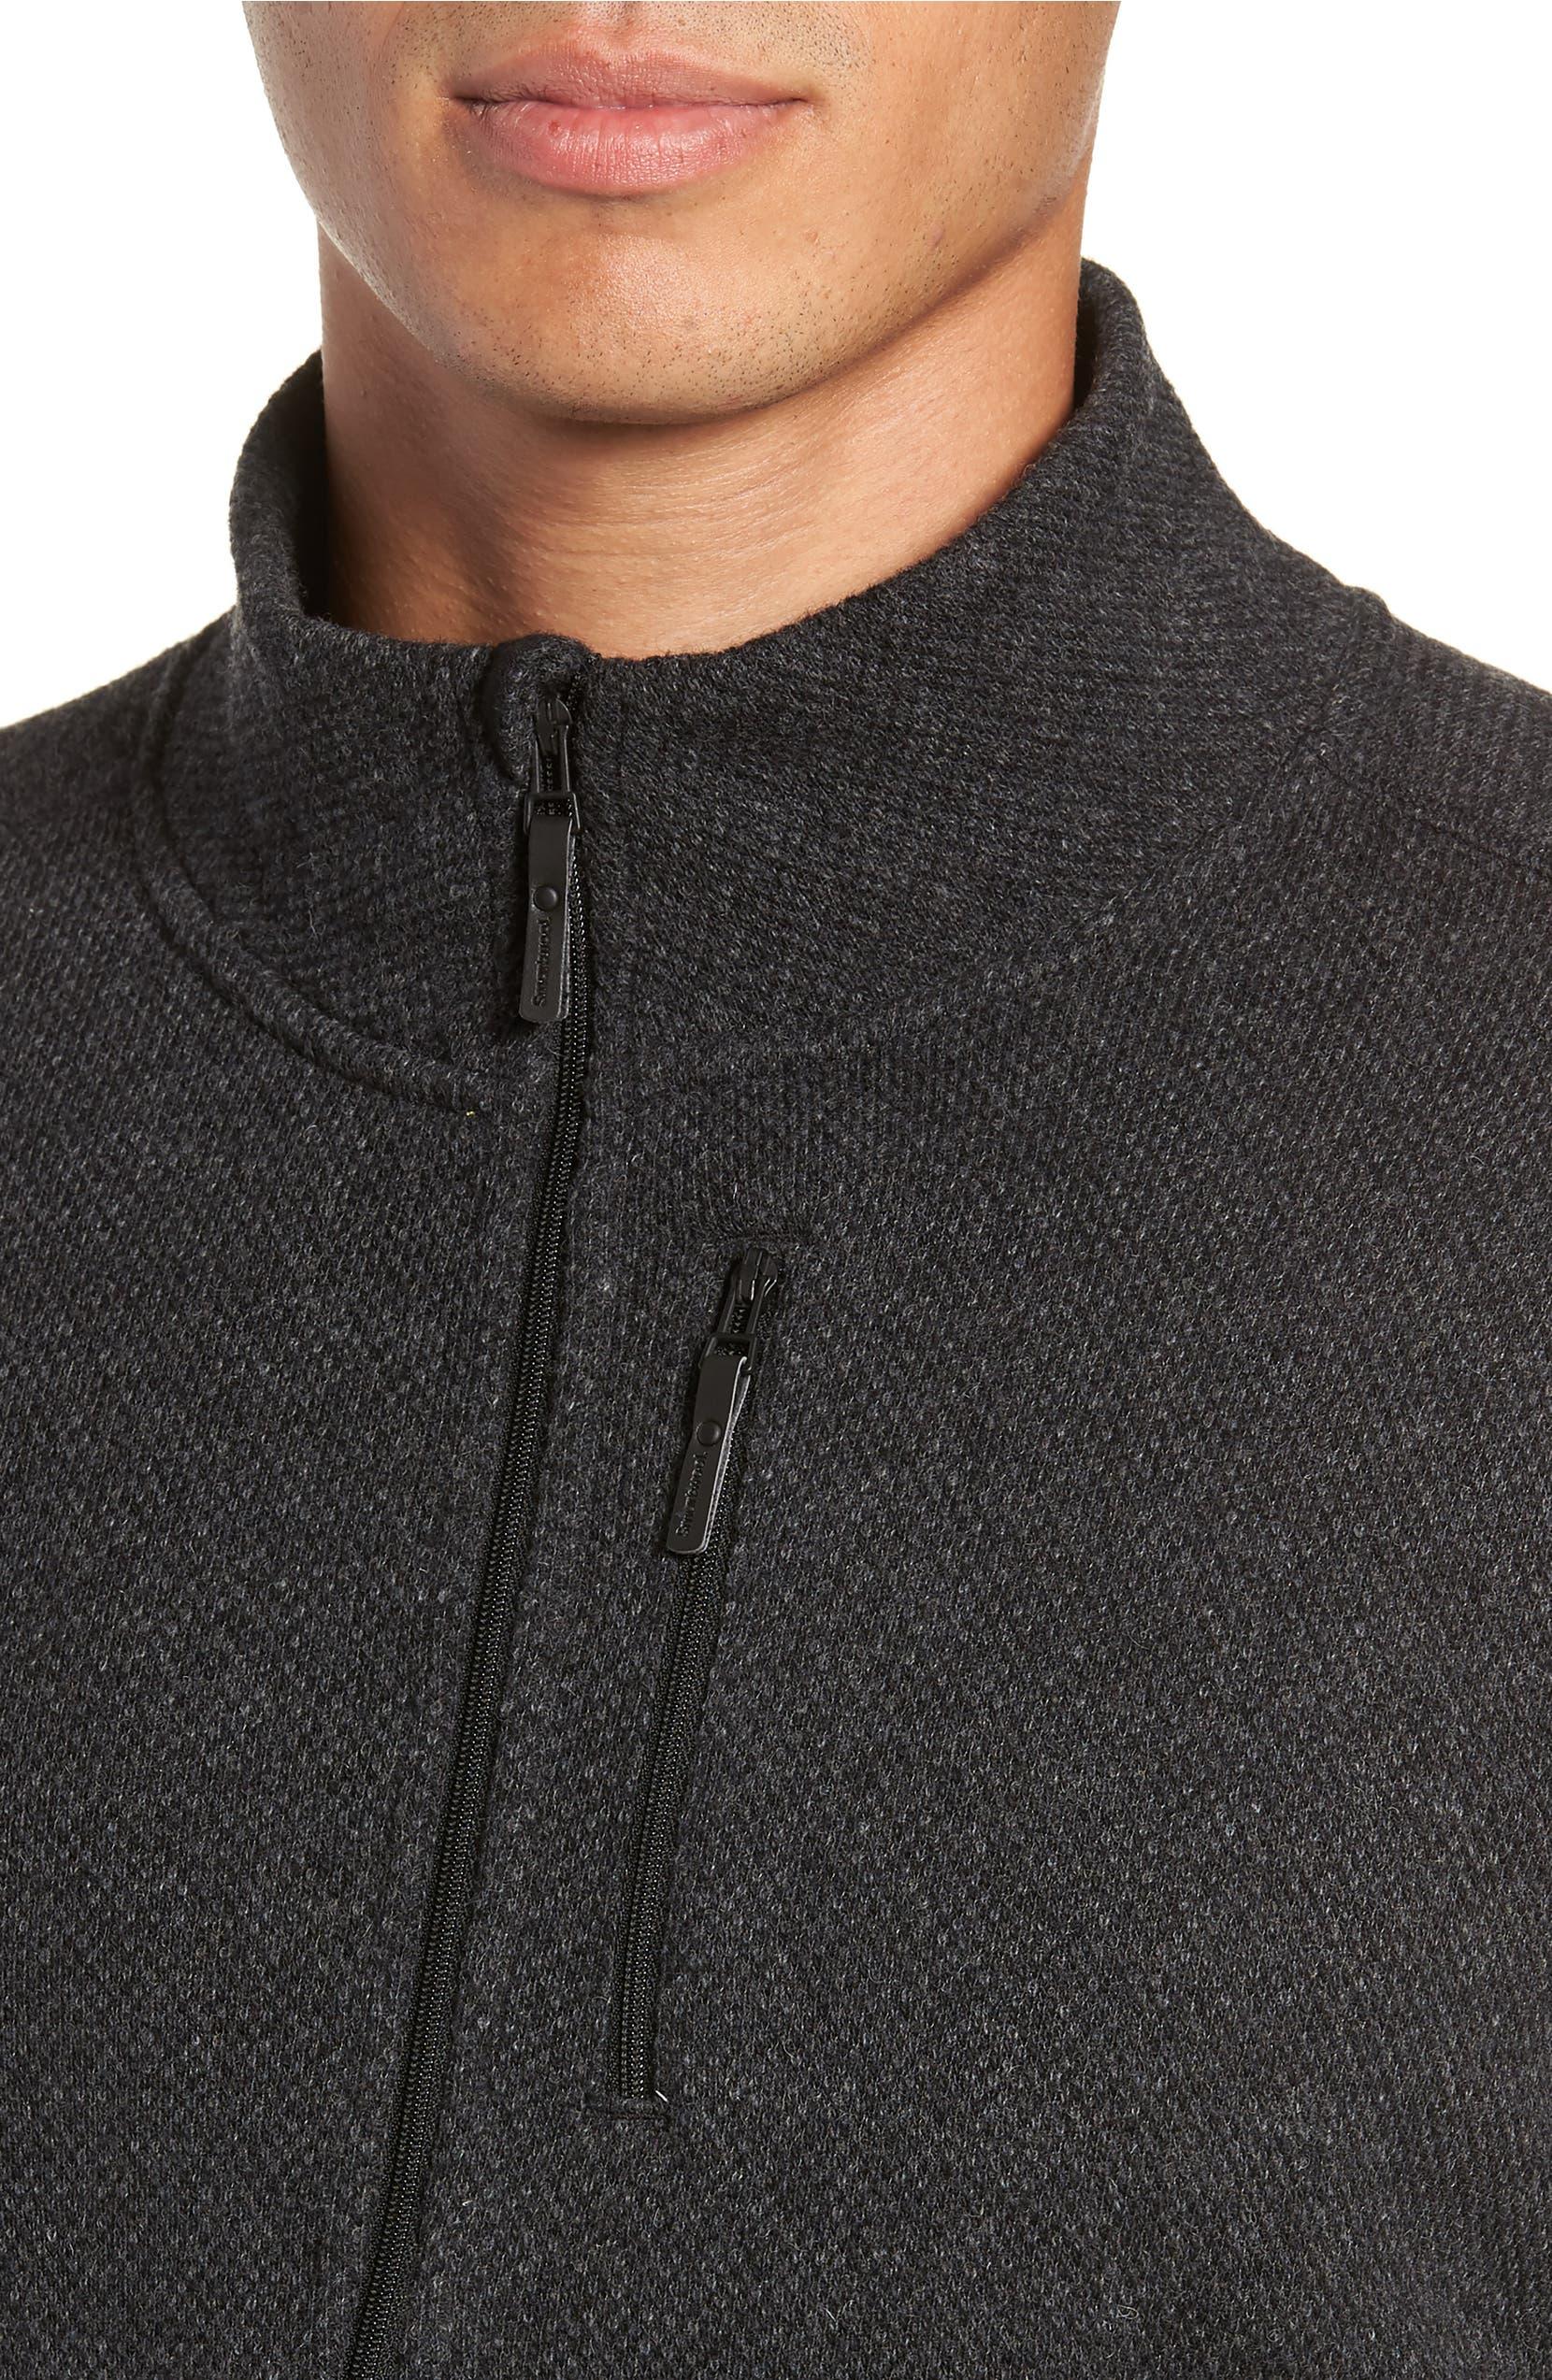 9d70fbbb0 Smartwool Hudson Trail Regular Fit Fleece Half-Zip Sweater | Nordstrom